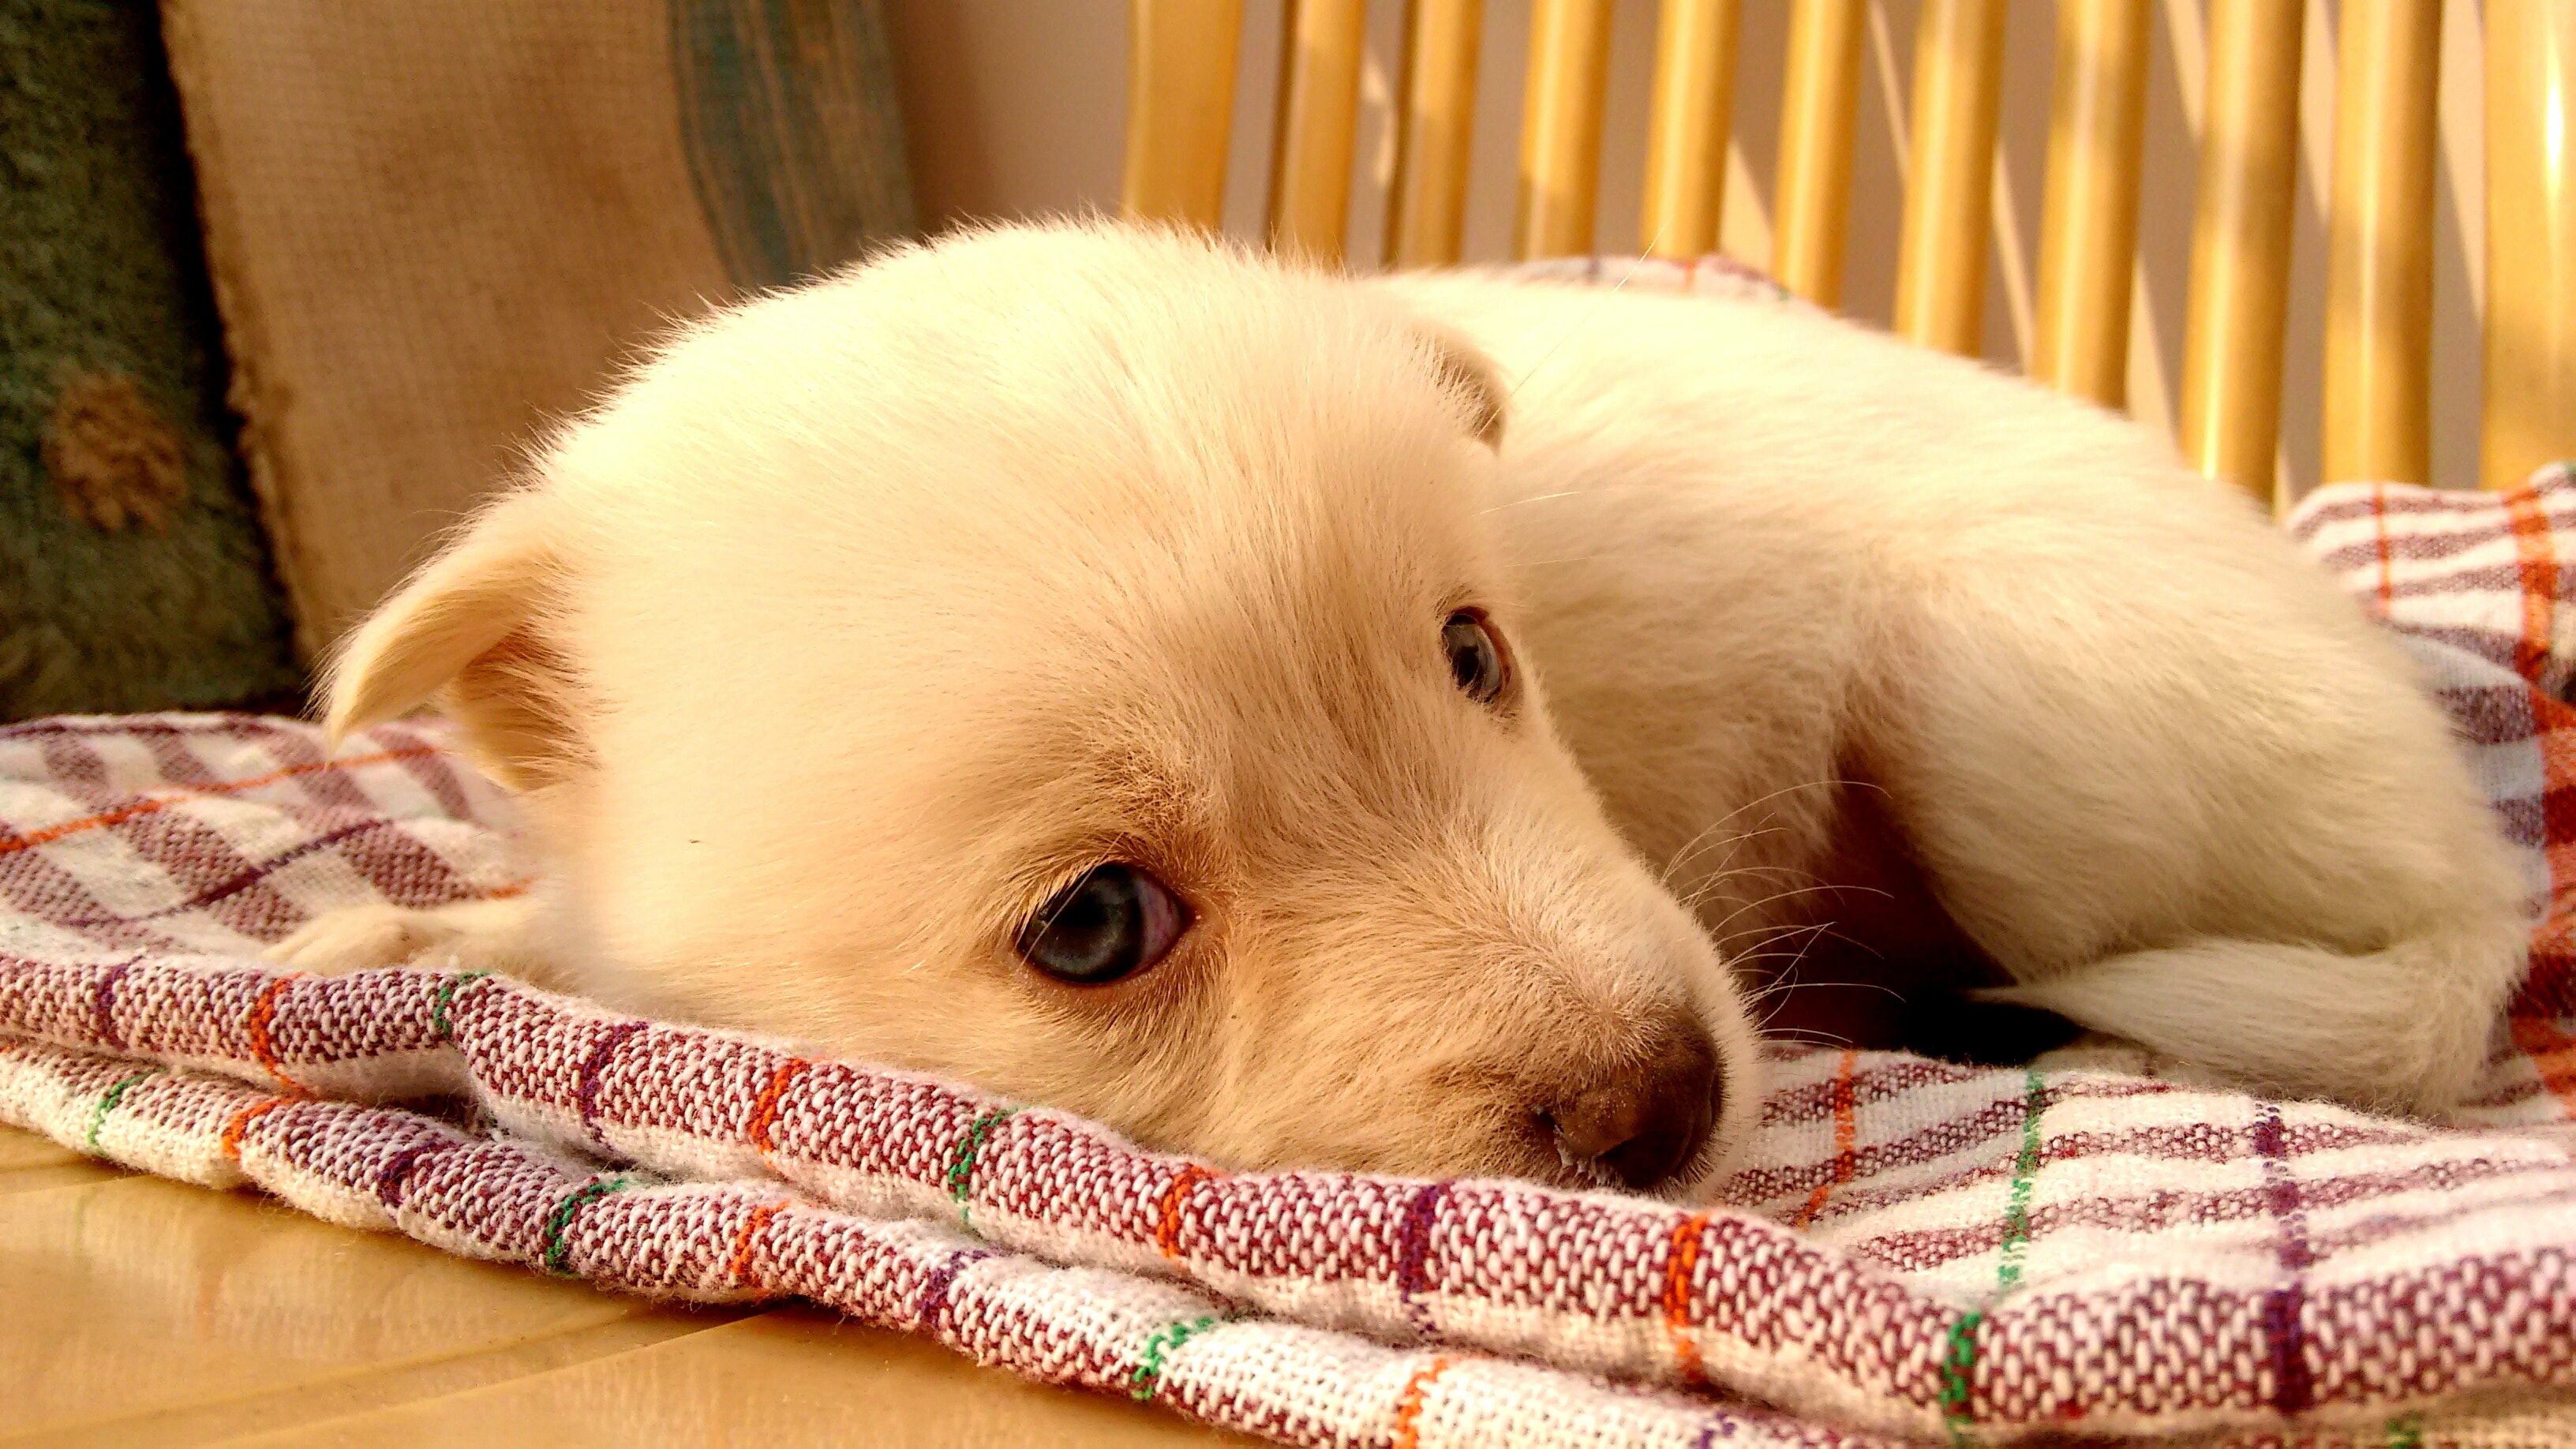 Puppy Sleep.jpg